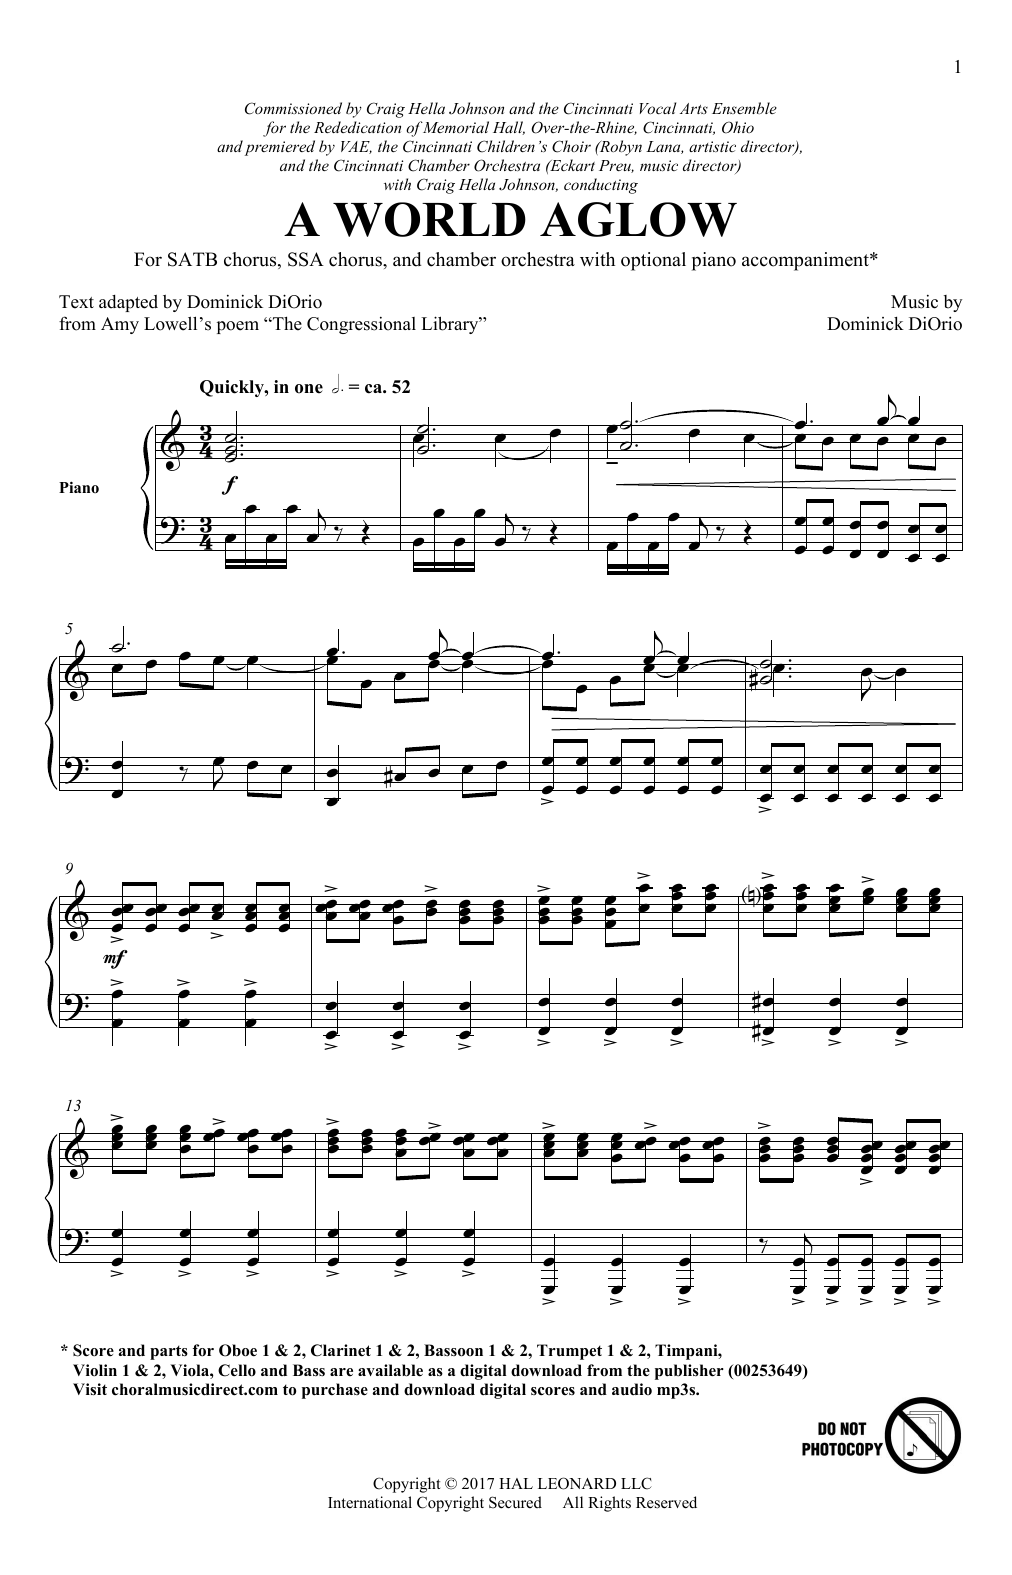 A World Aglow Sheet Music